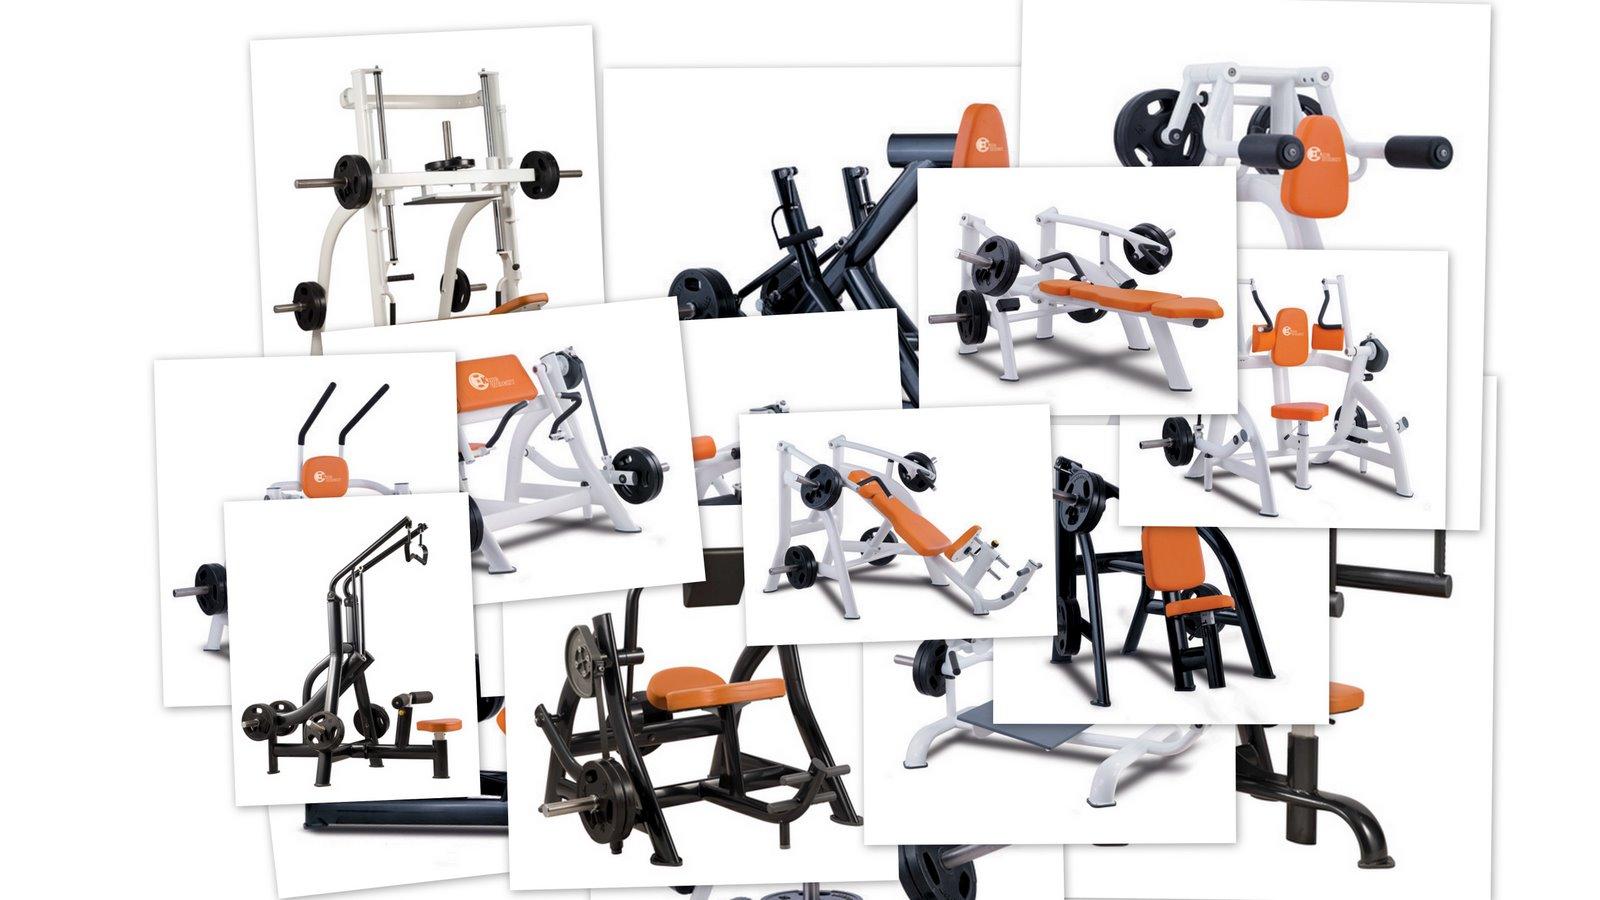 Maquinas para gimnasio muscul fitness m quinas para - Equipamiento de gimnasios ...